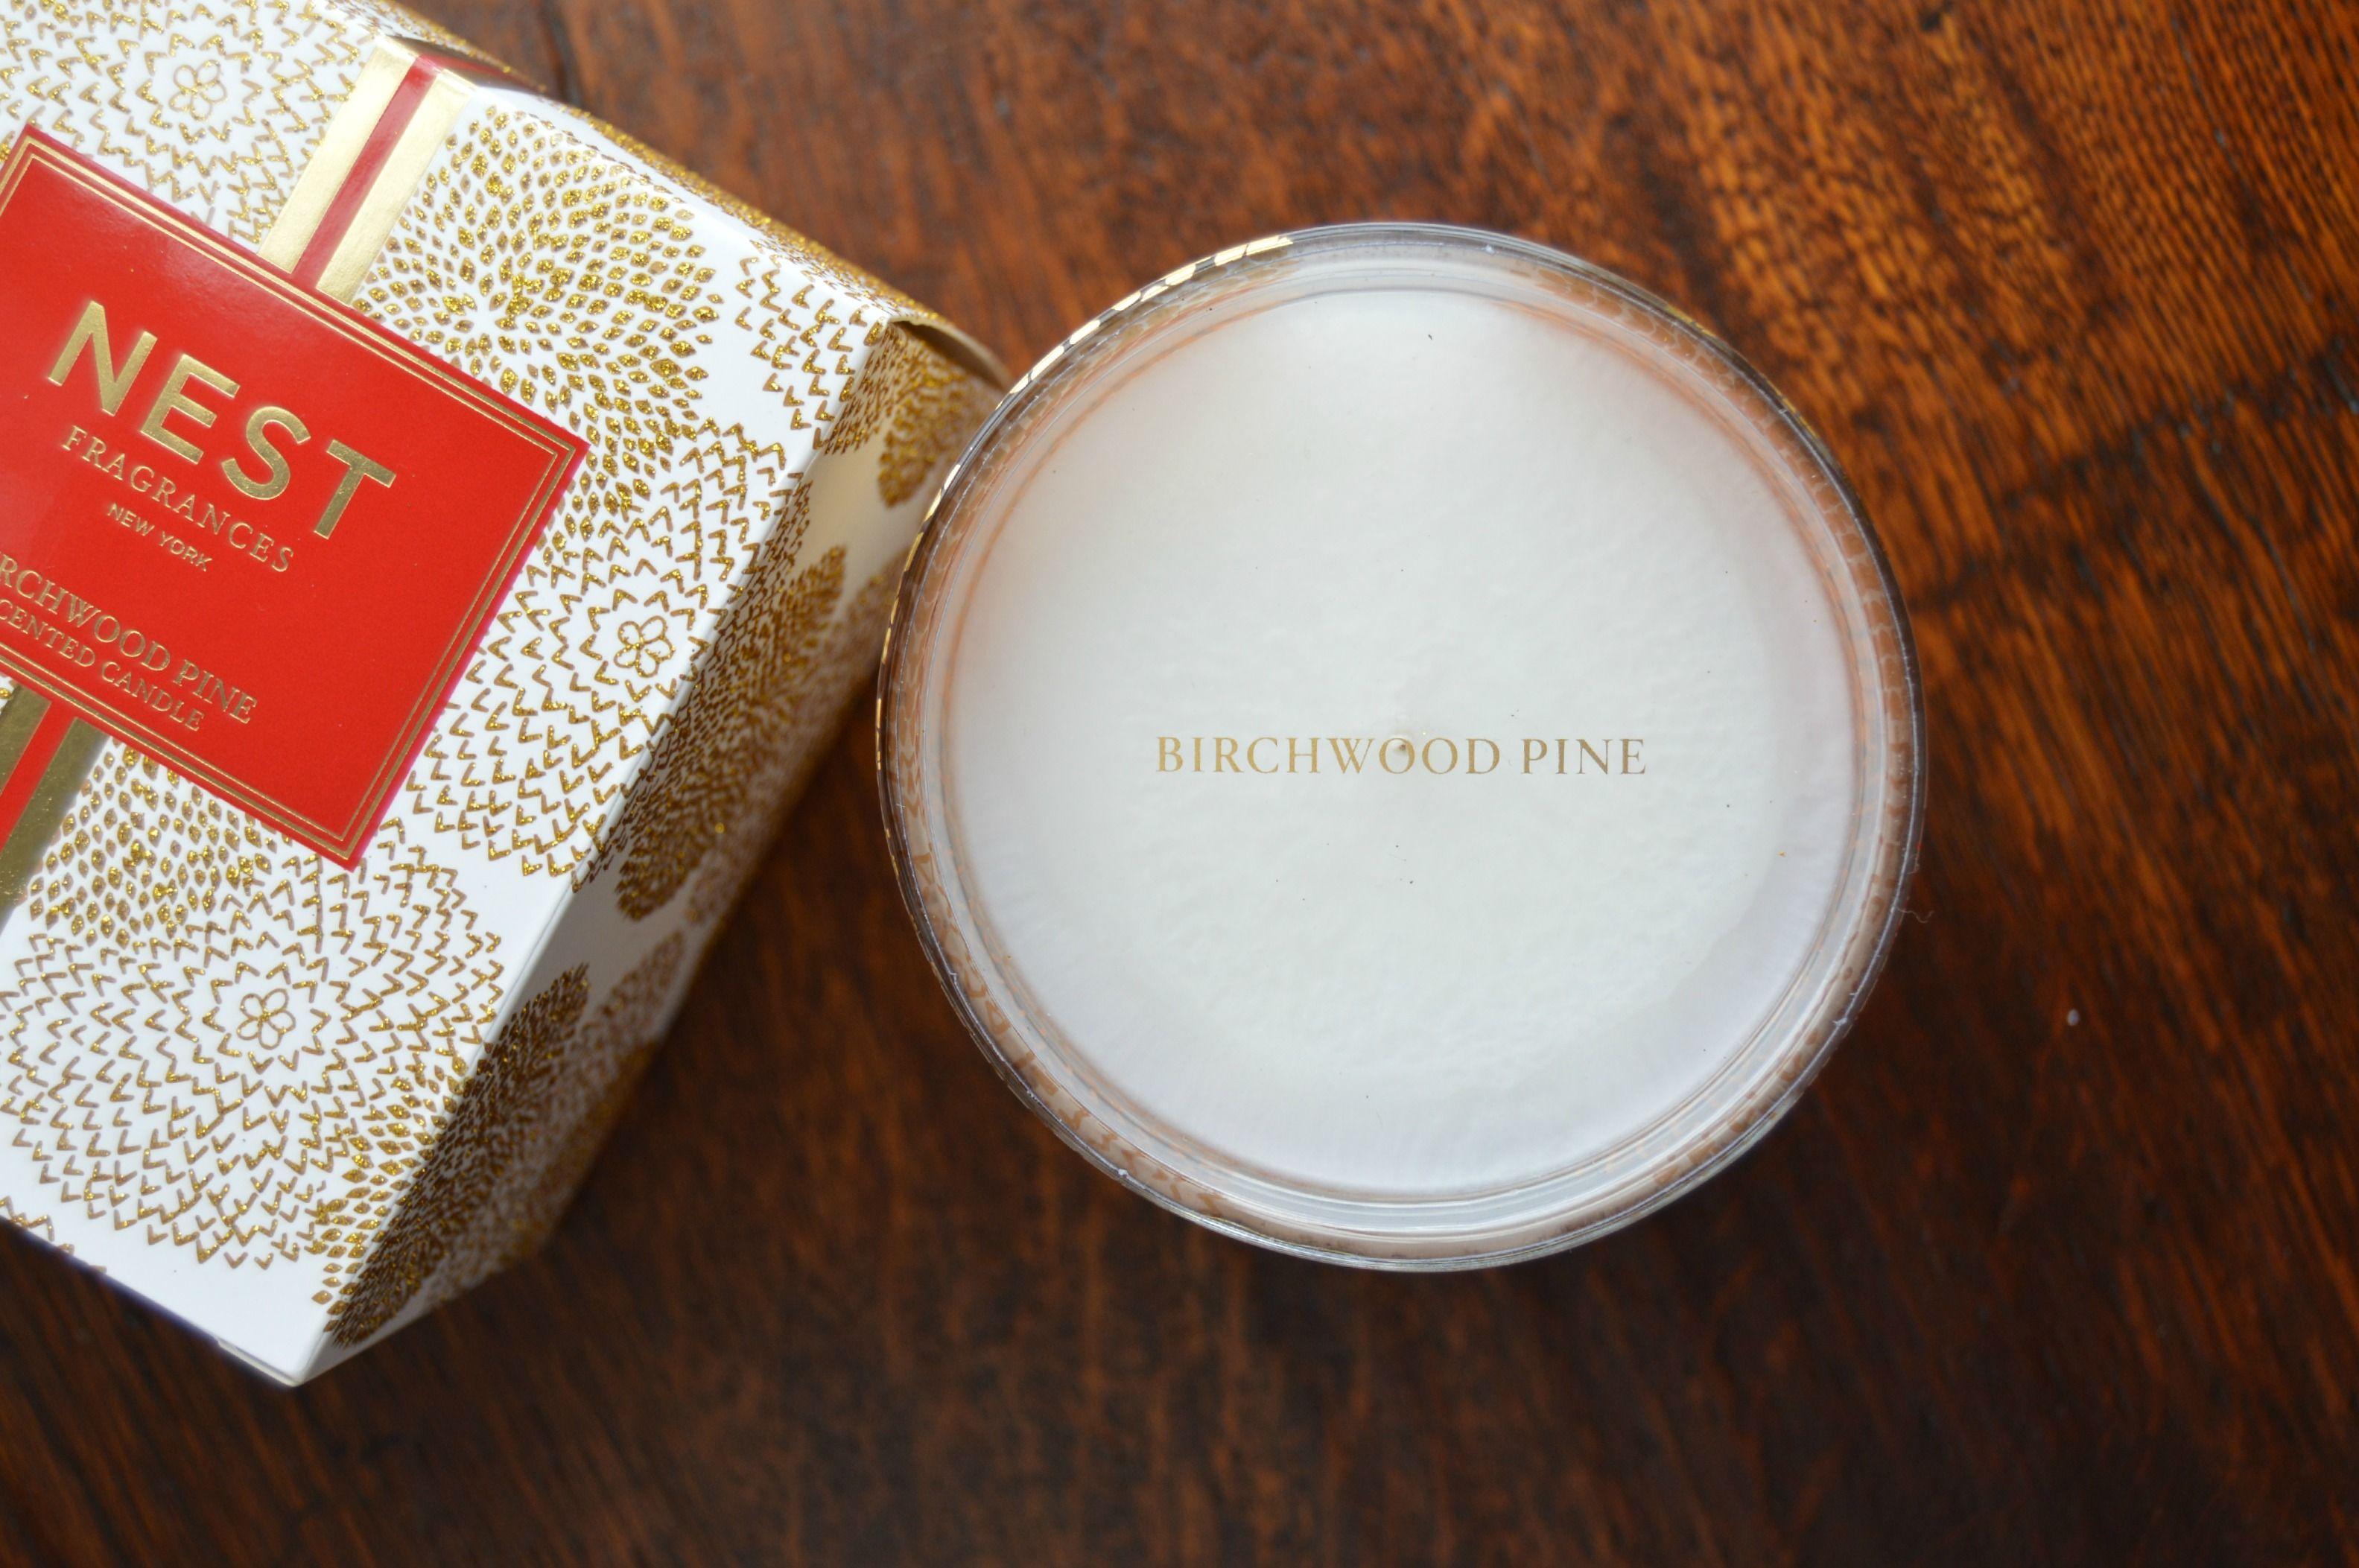 In Season – NEST Fragrances Birchwood Pine Candle #lbloggers #NestFragrances #NeimanMarcus #Holiday #Sephora